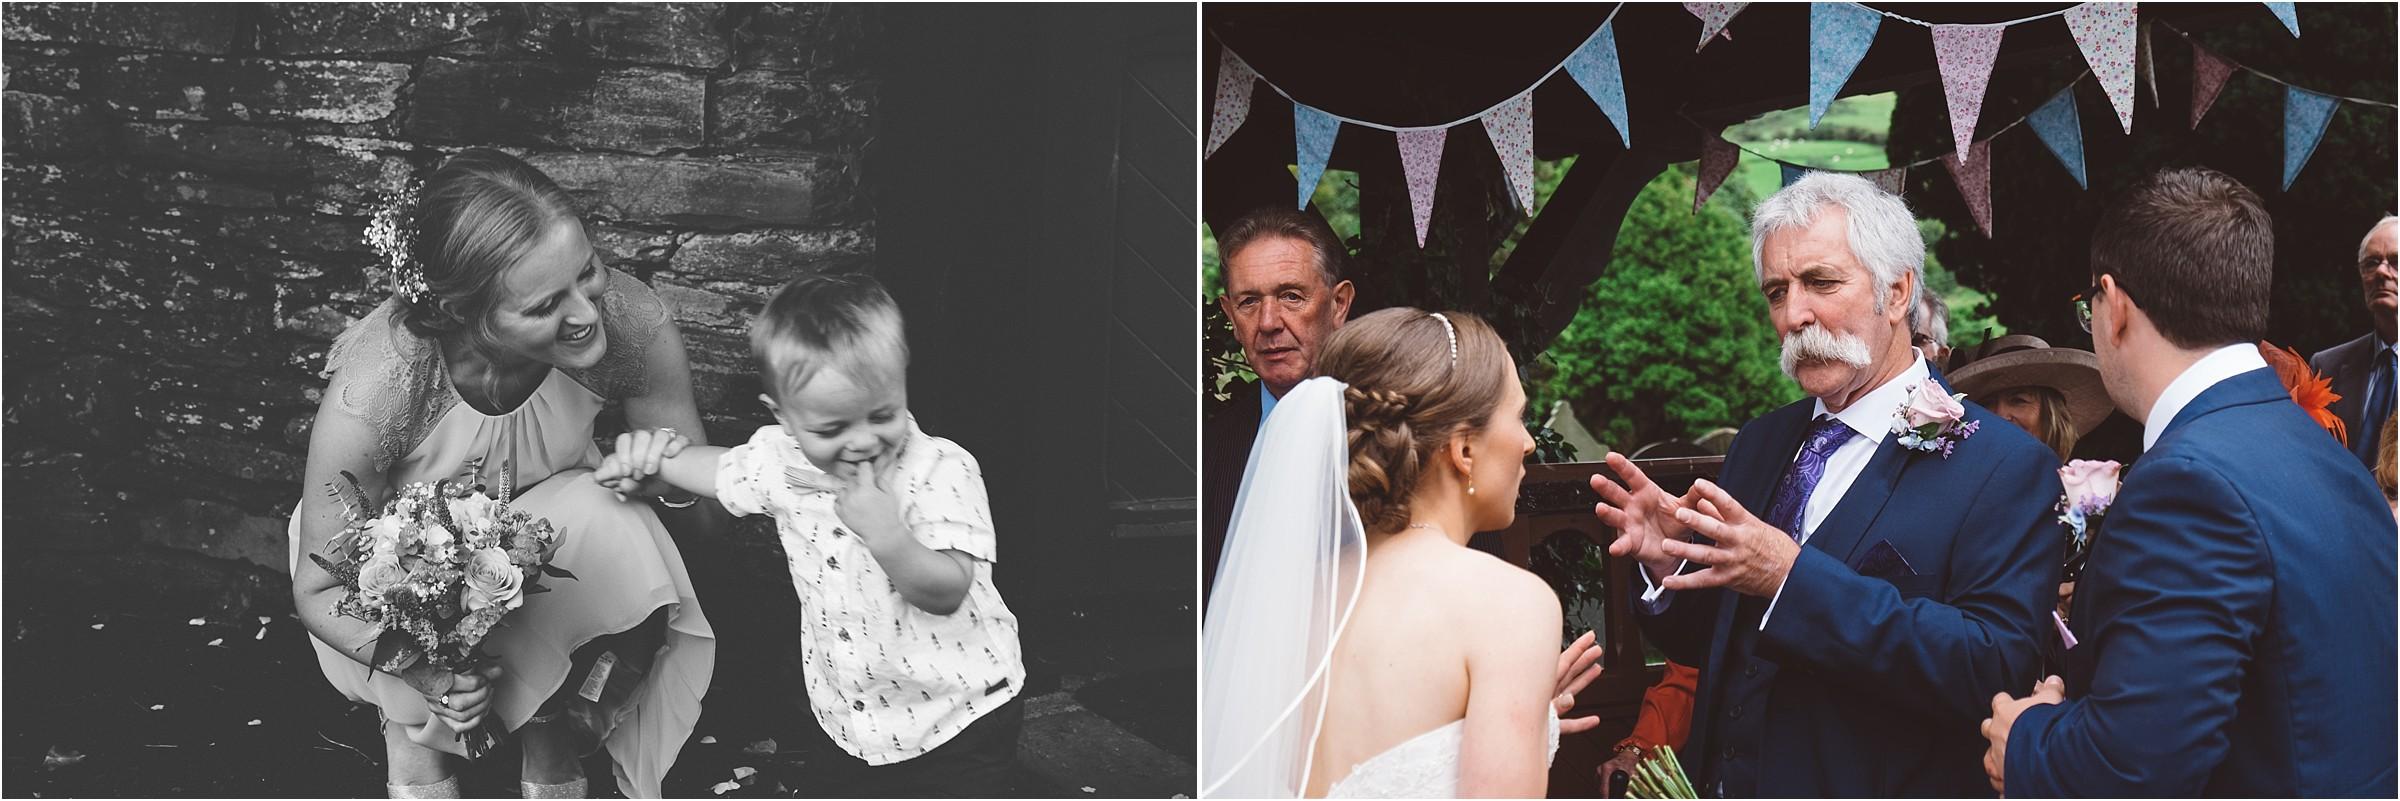 108 tipi wedding T1012341